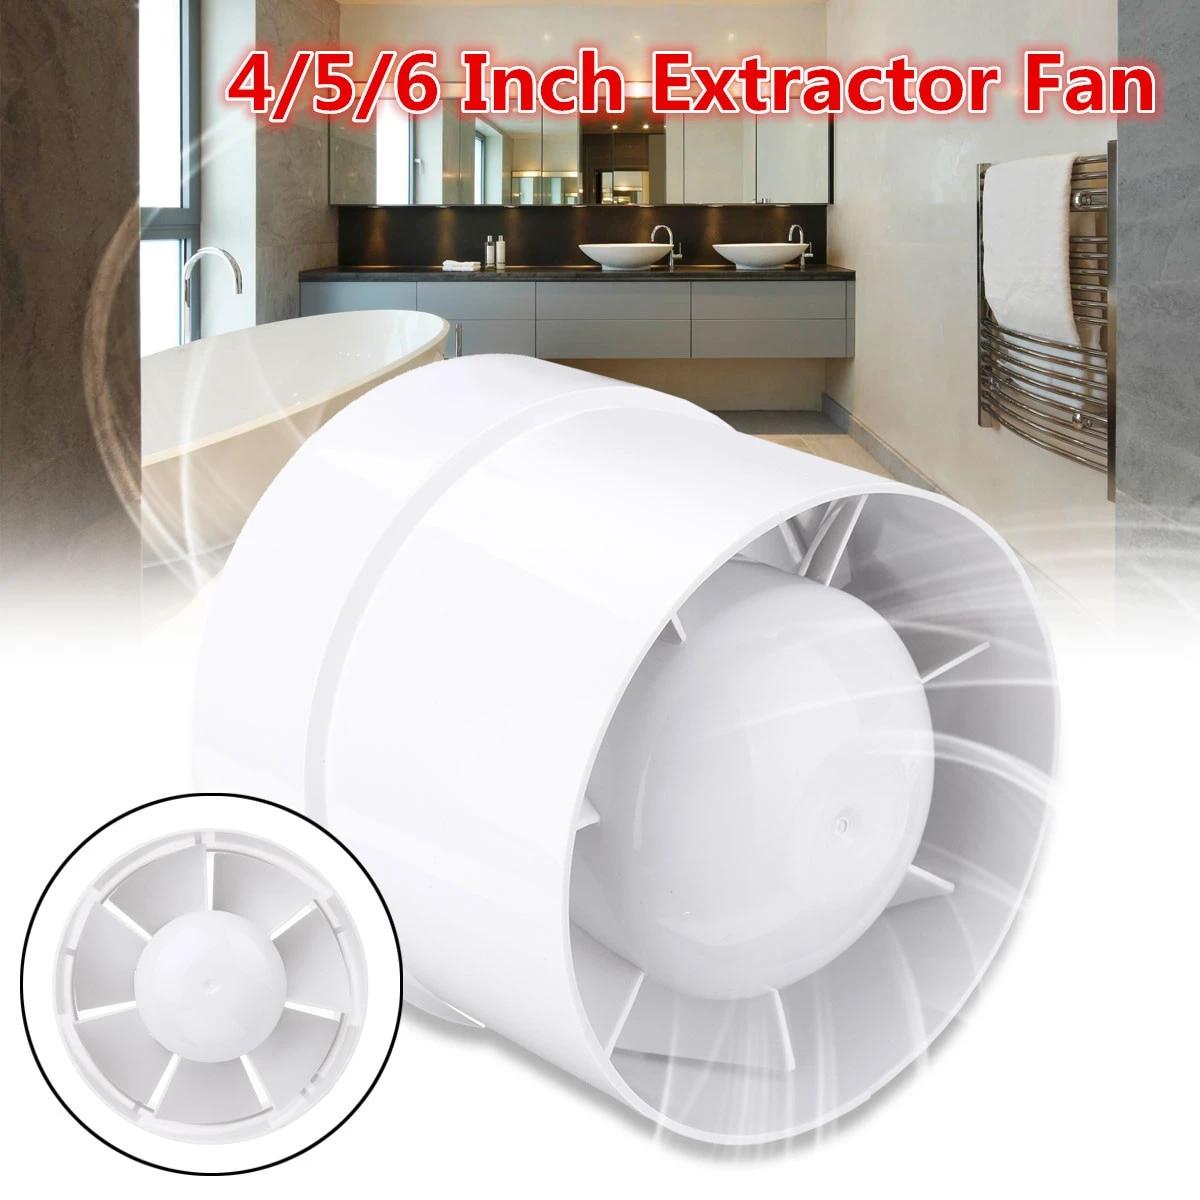 20/20/20 Inch Waterproof Mute Bathroom Extractor Exhaust Fan Window For Home  Kitchen Toilet Air Vent Ventilation Fans Extractor Fan